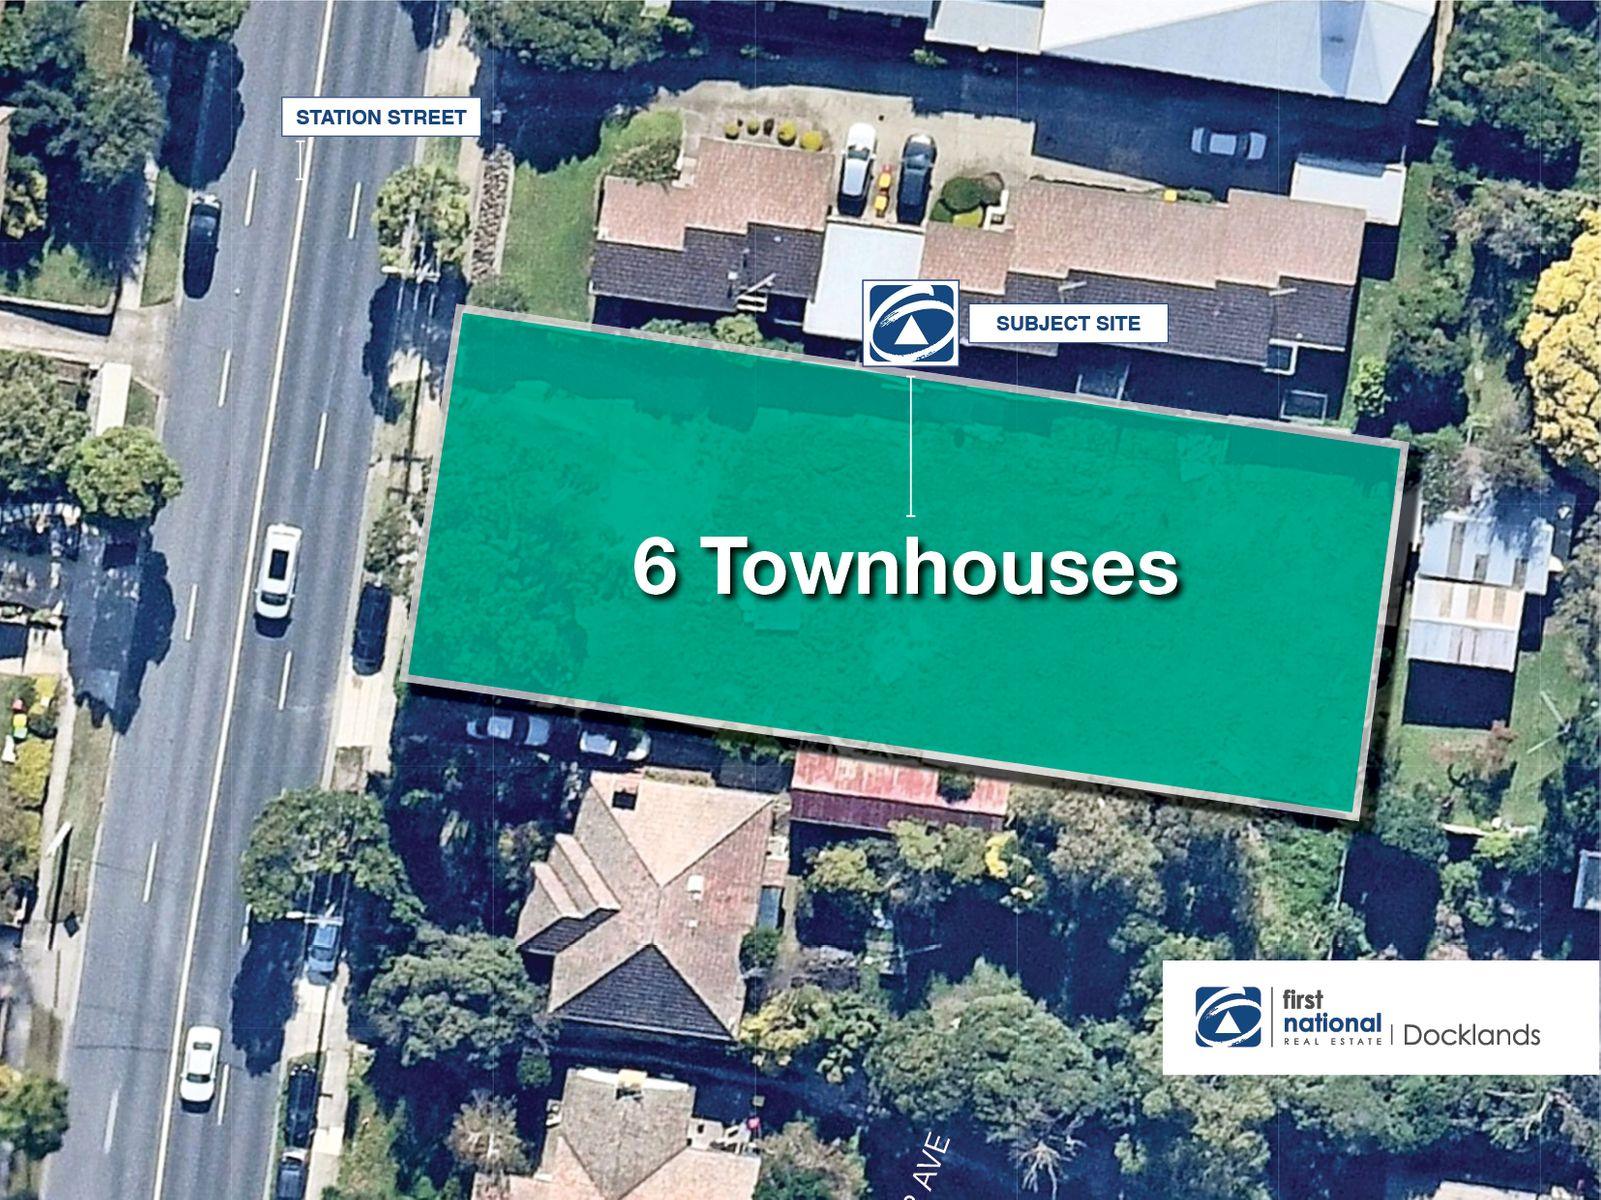 1/38 Station Street, Burwood, VIC 3125